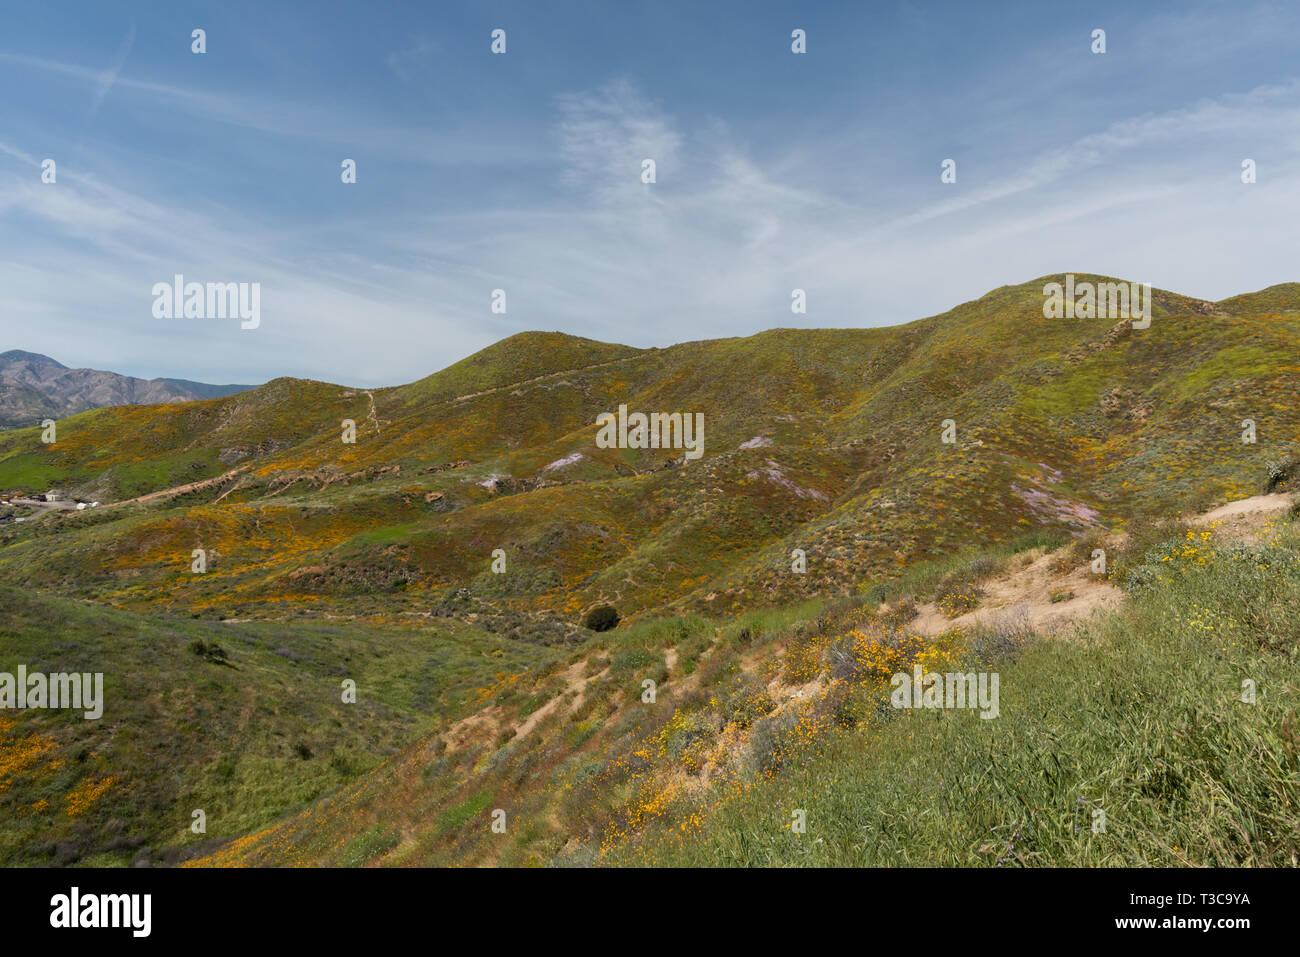 Beautiful superbloom vista in the Walker Canyon mountain range near Lake Elsinore, Southern California - Stock Image